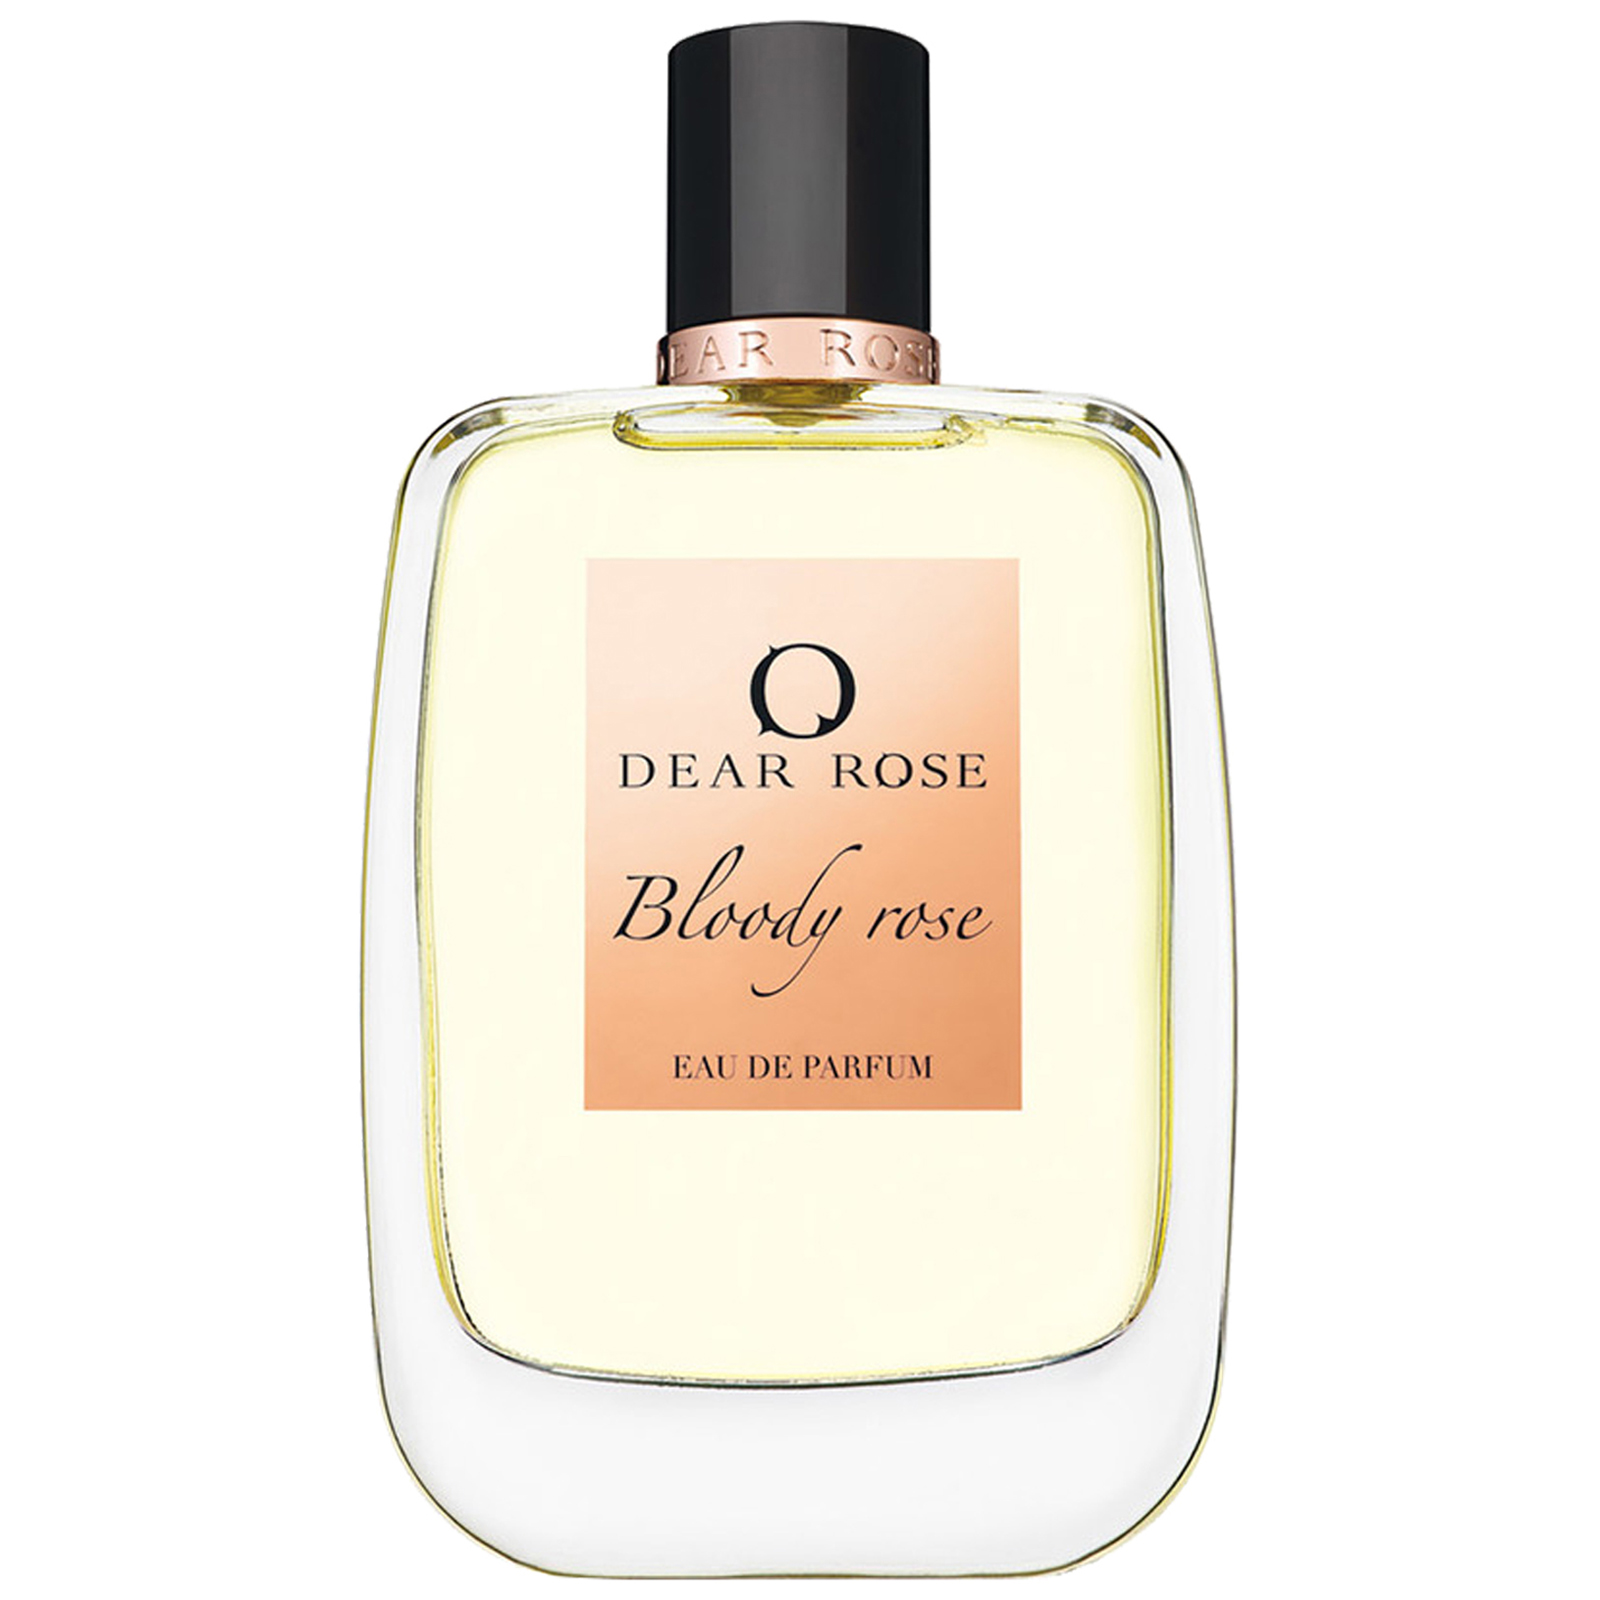 Bloody rose profumo eau de parfum 100 ml